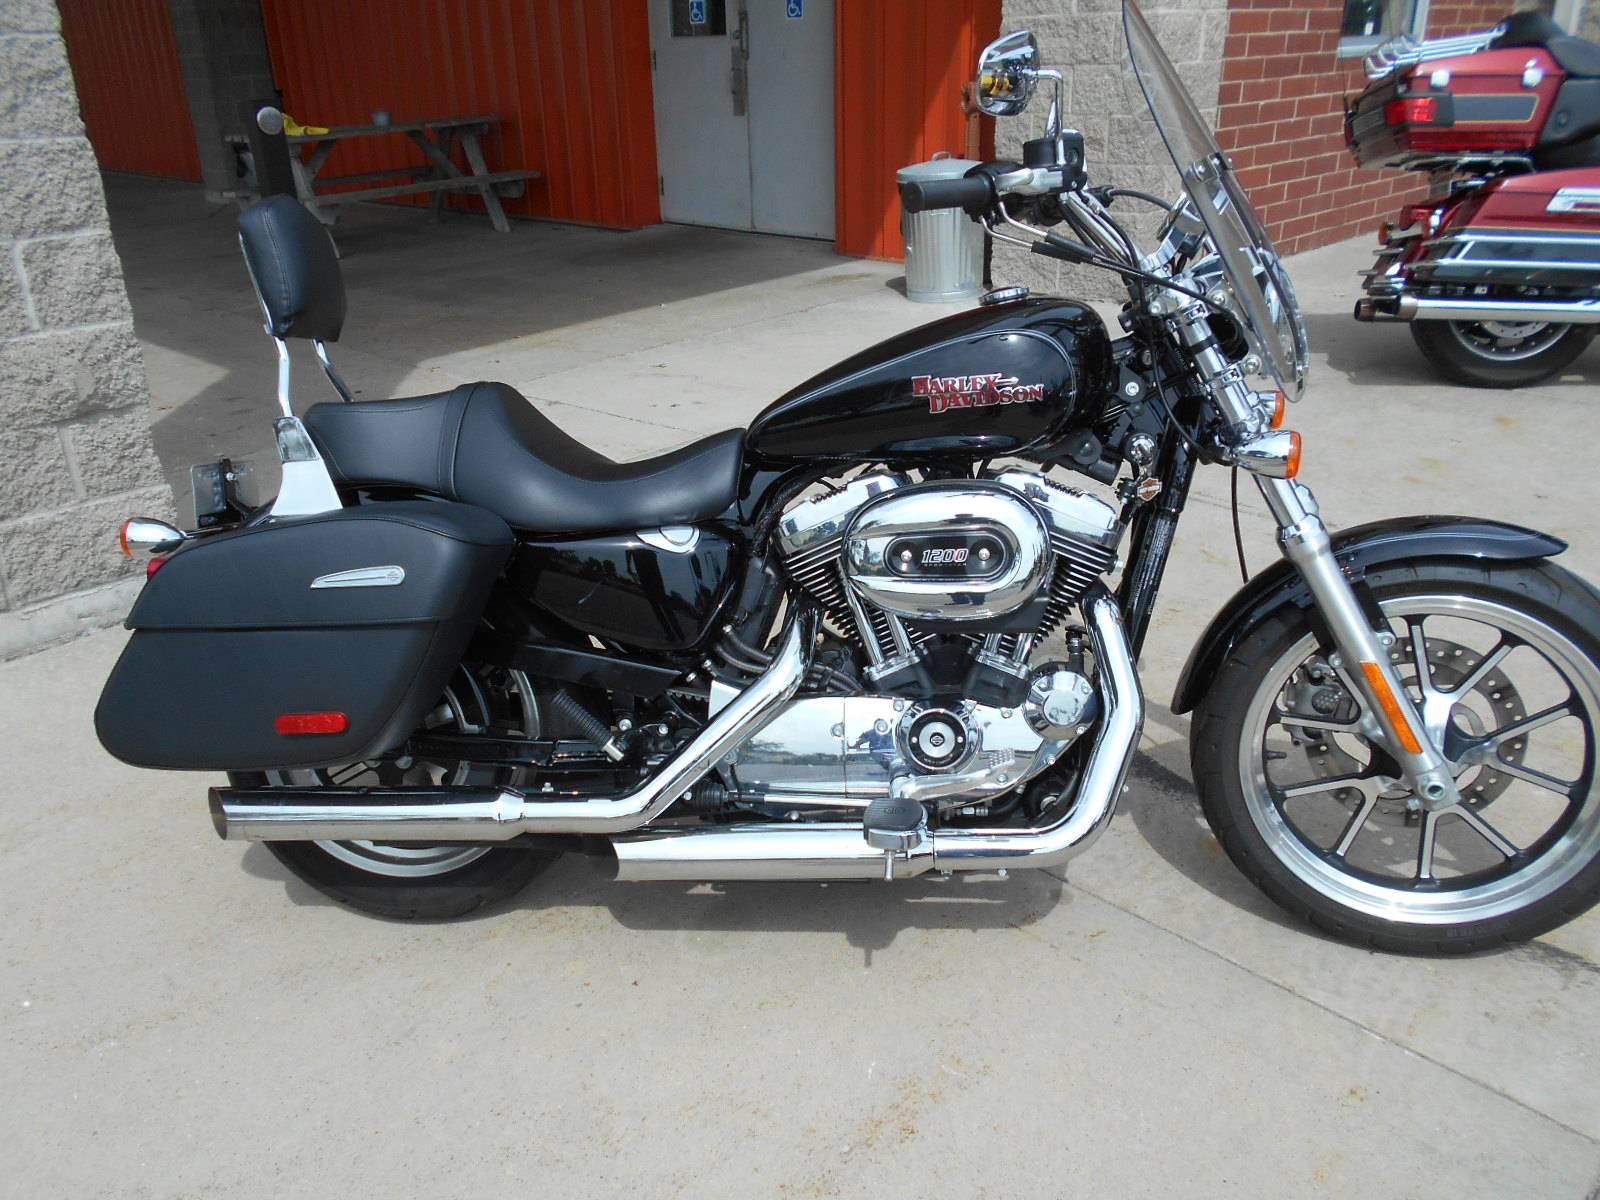 2014 Harley-Davidson SuperLow® 1200T in Mauston, Wisconsin